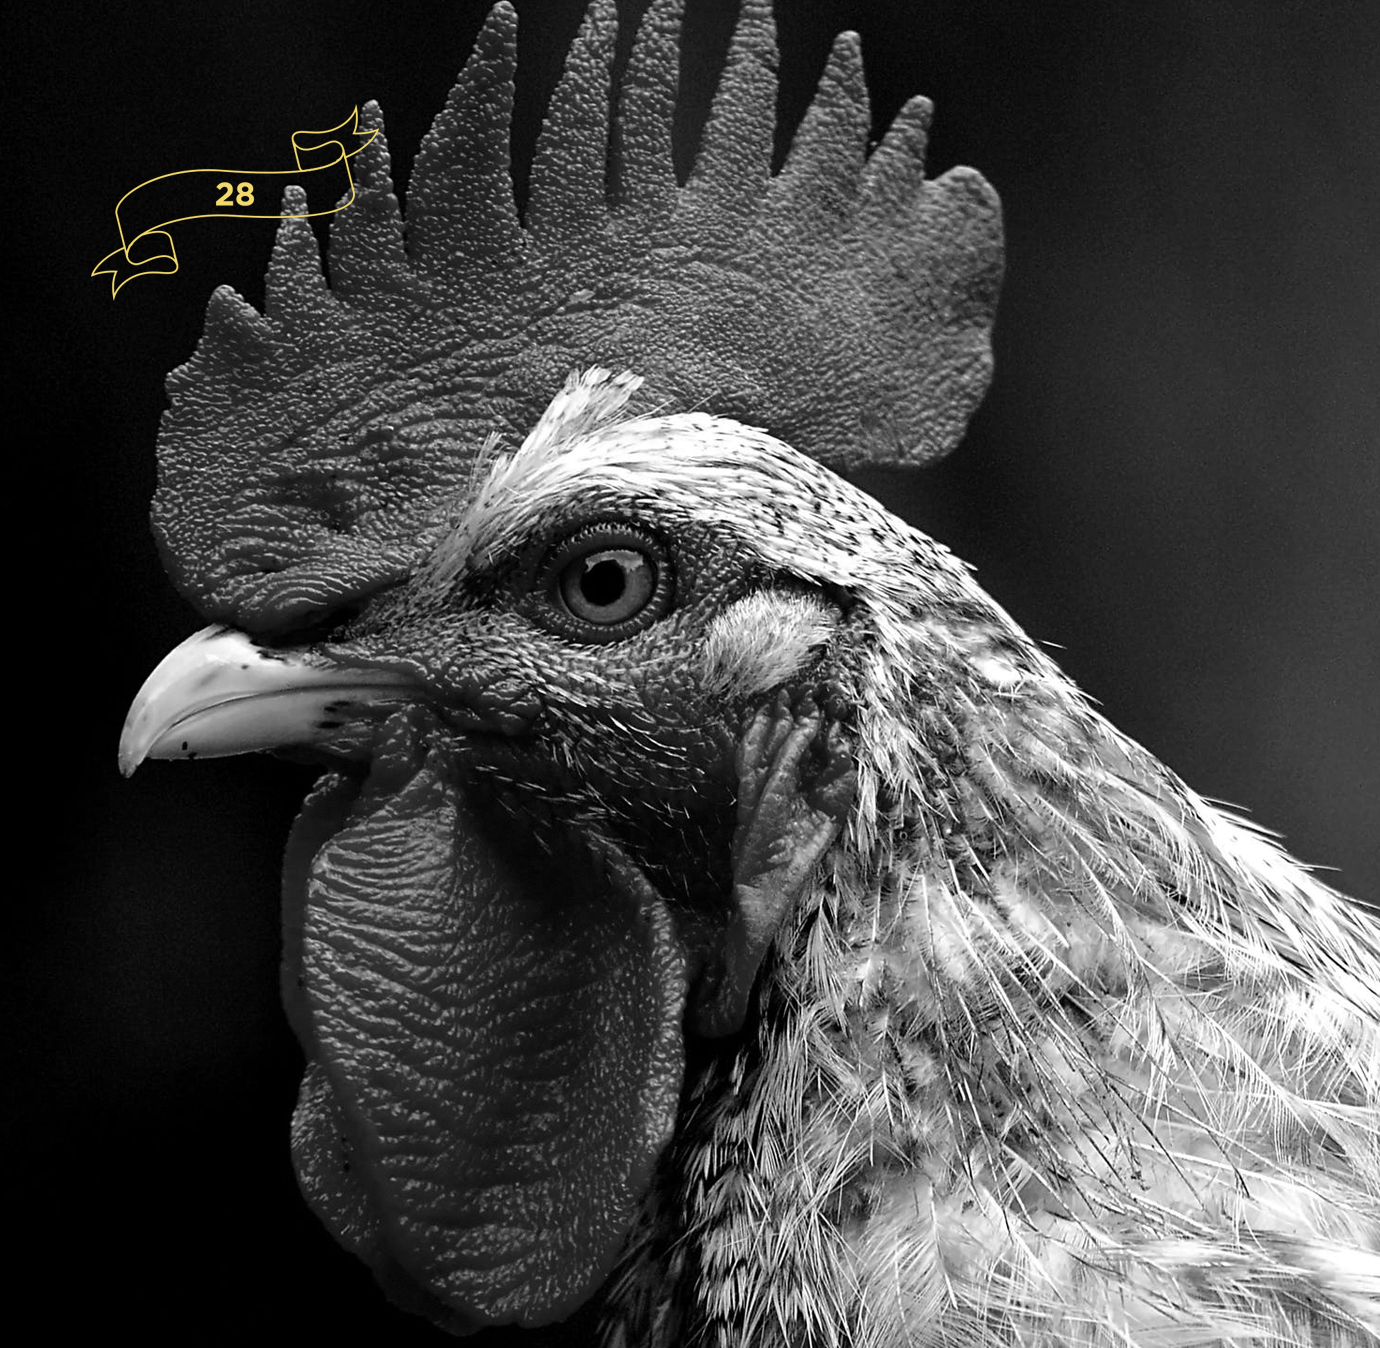 rooster-el-bravo-yoenpaperland